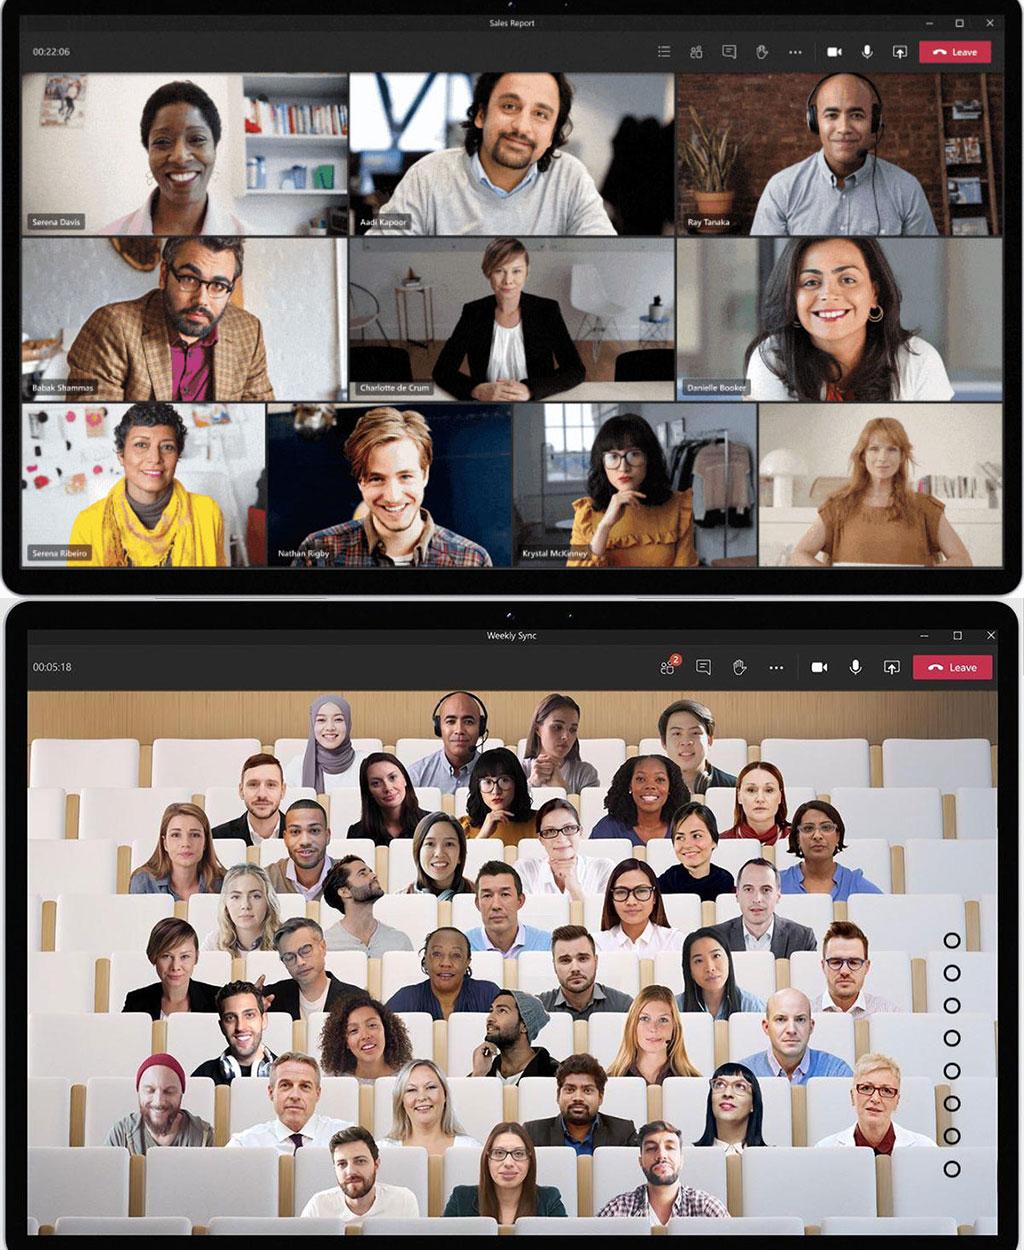 Videokonferenz im virtuellen Hörsaal: MS Teams jetzt mit Together Mode